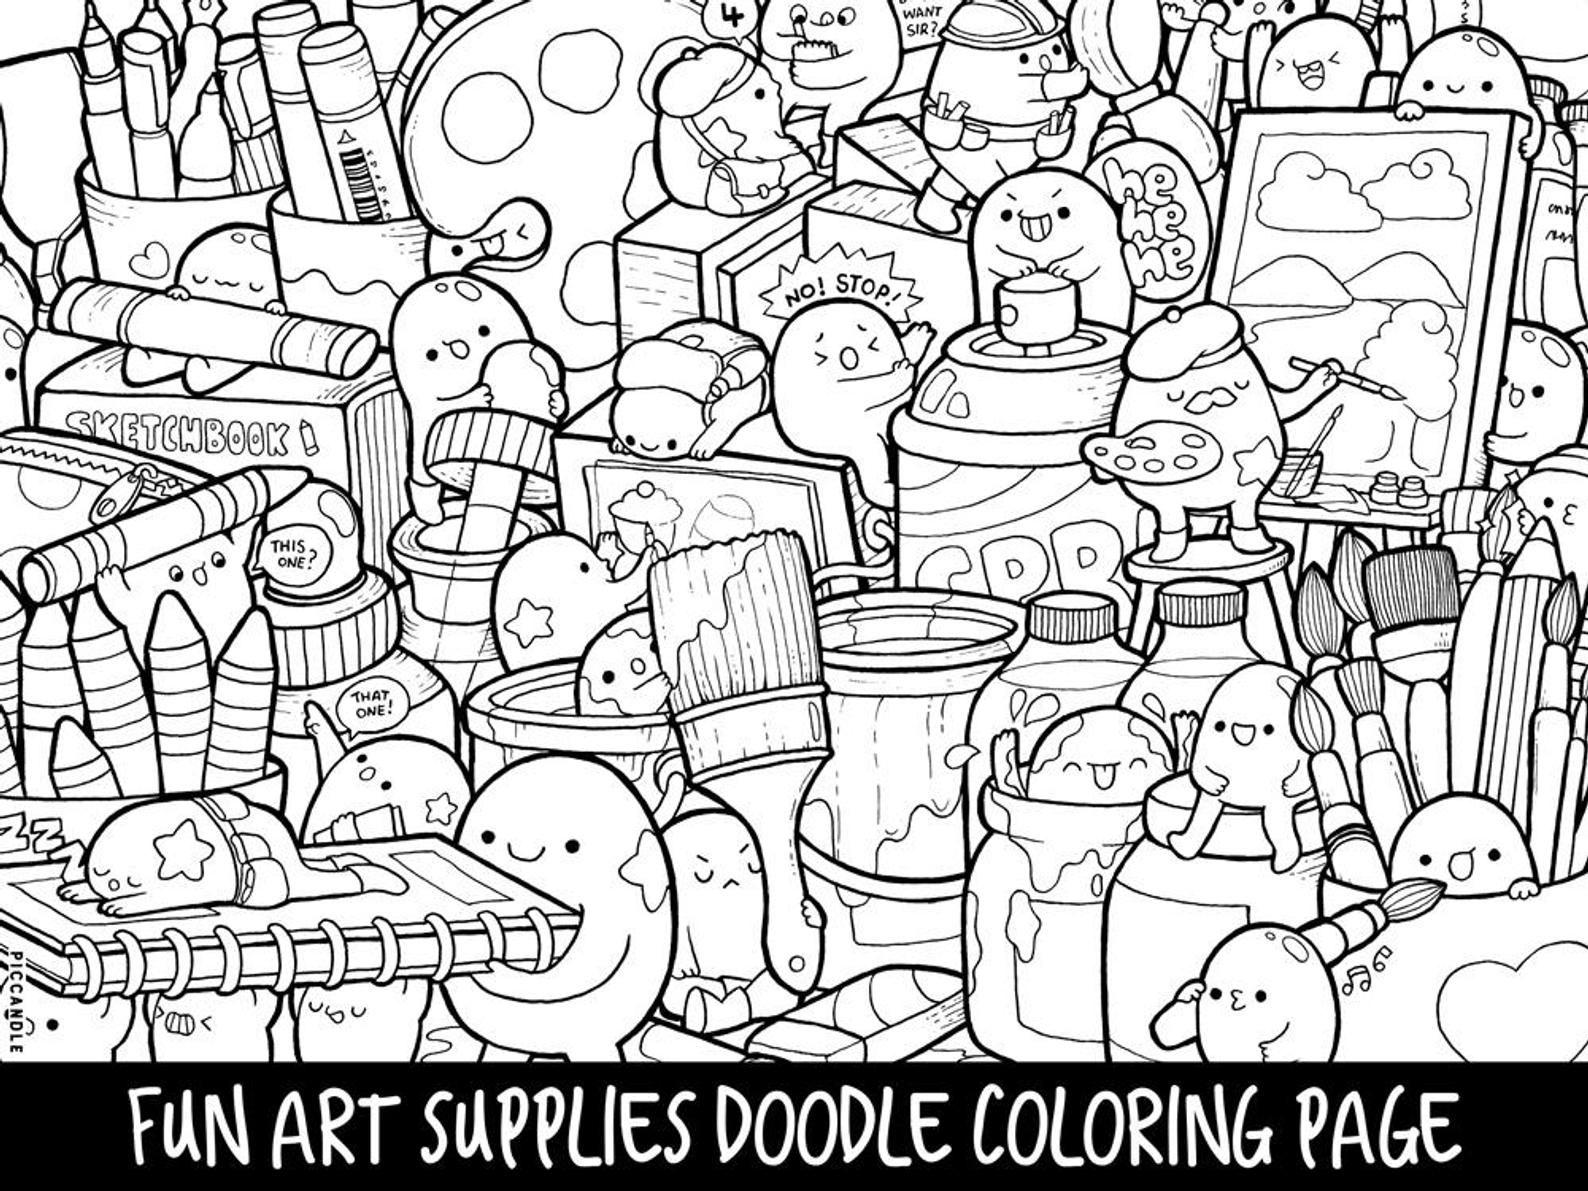 Art Supplies Doodle Coloring Page Printable Cute Kawaii Etsy Doodle Coloring Monster Coloring Pages Kawaii Doodles